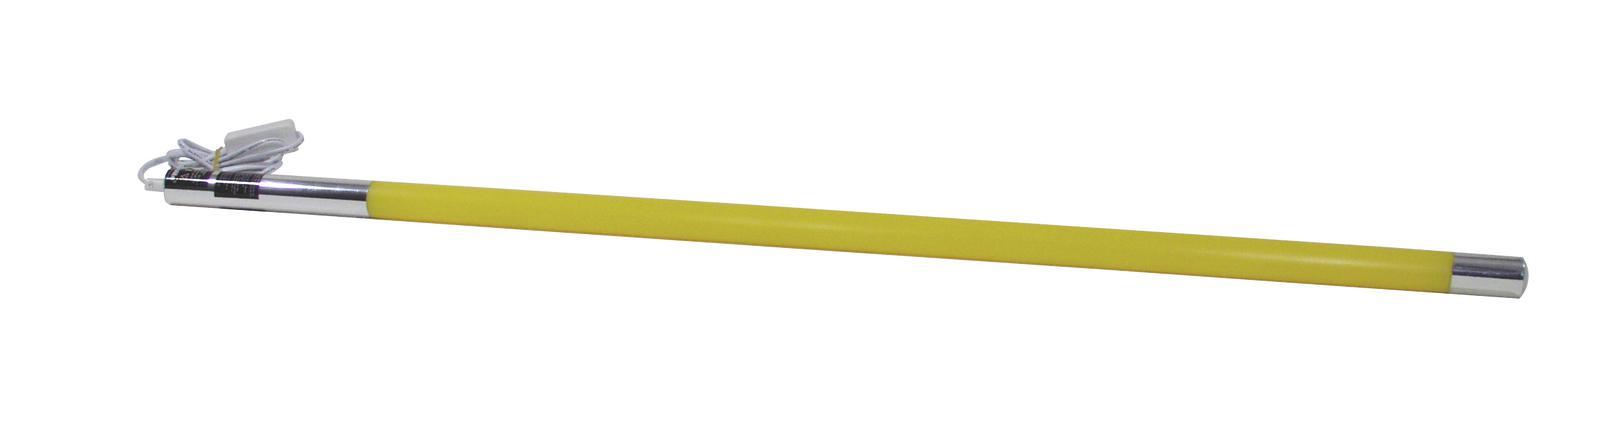 EUROLITE Leuchtstab T5 20W 105cm gelb